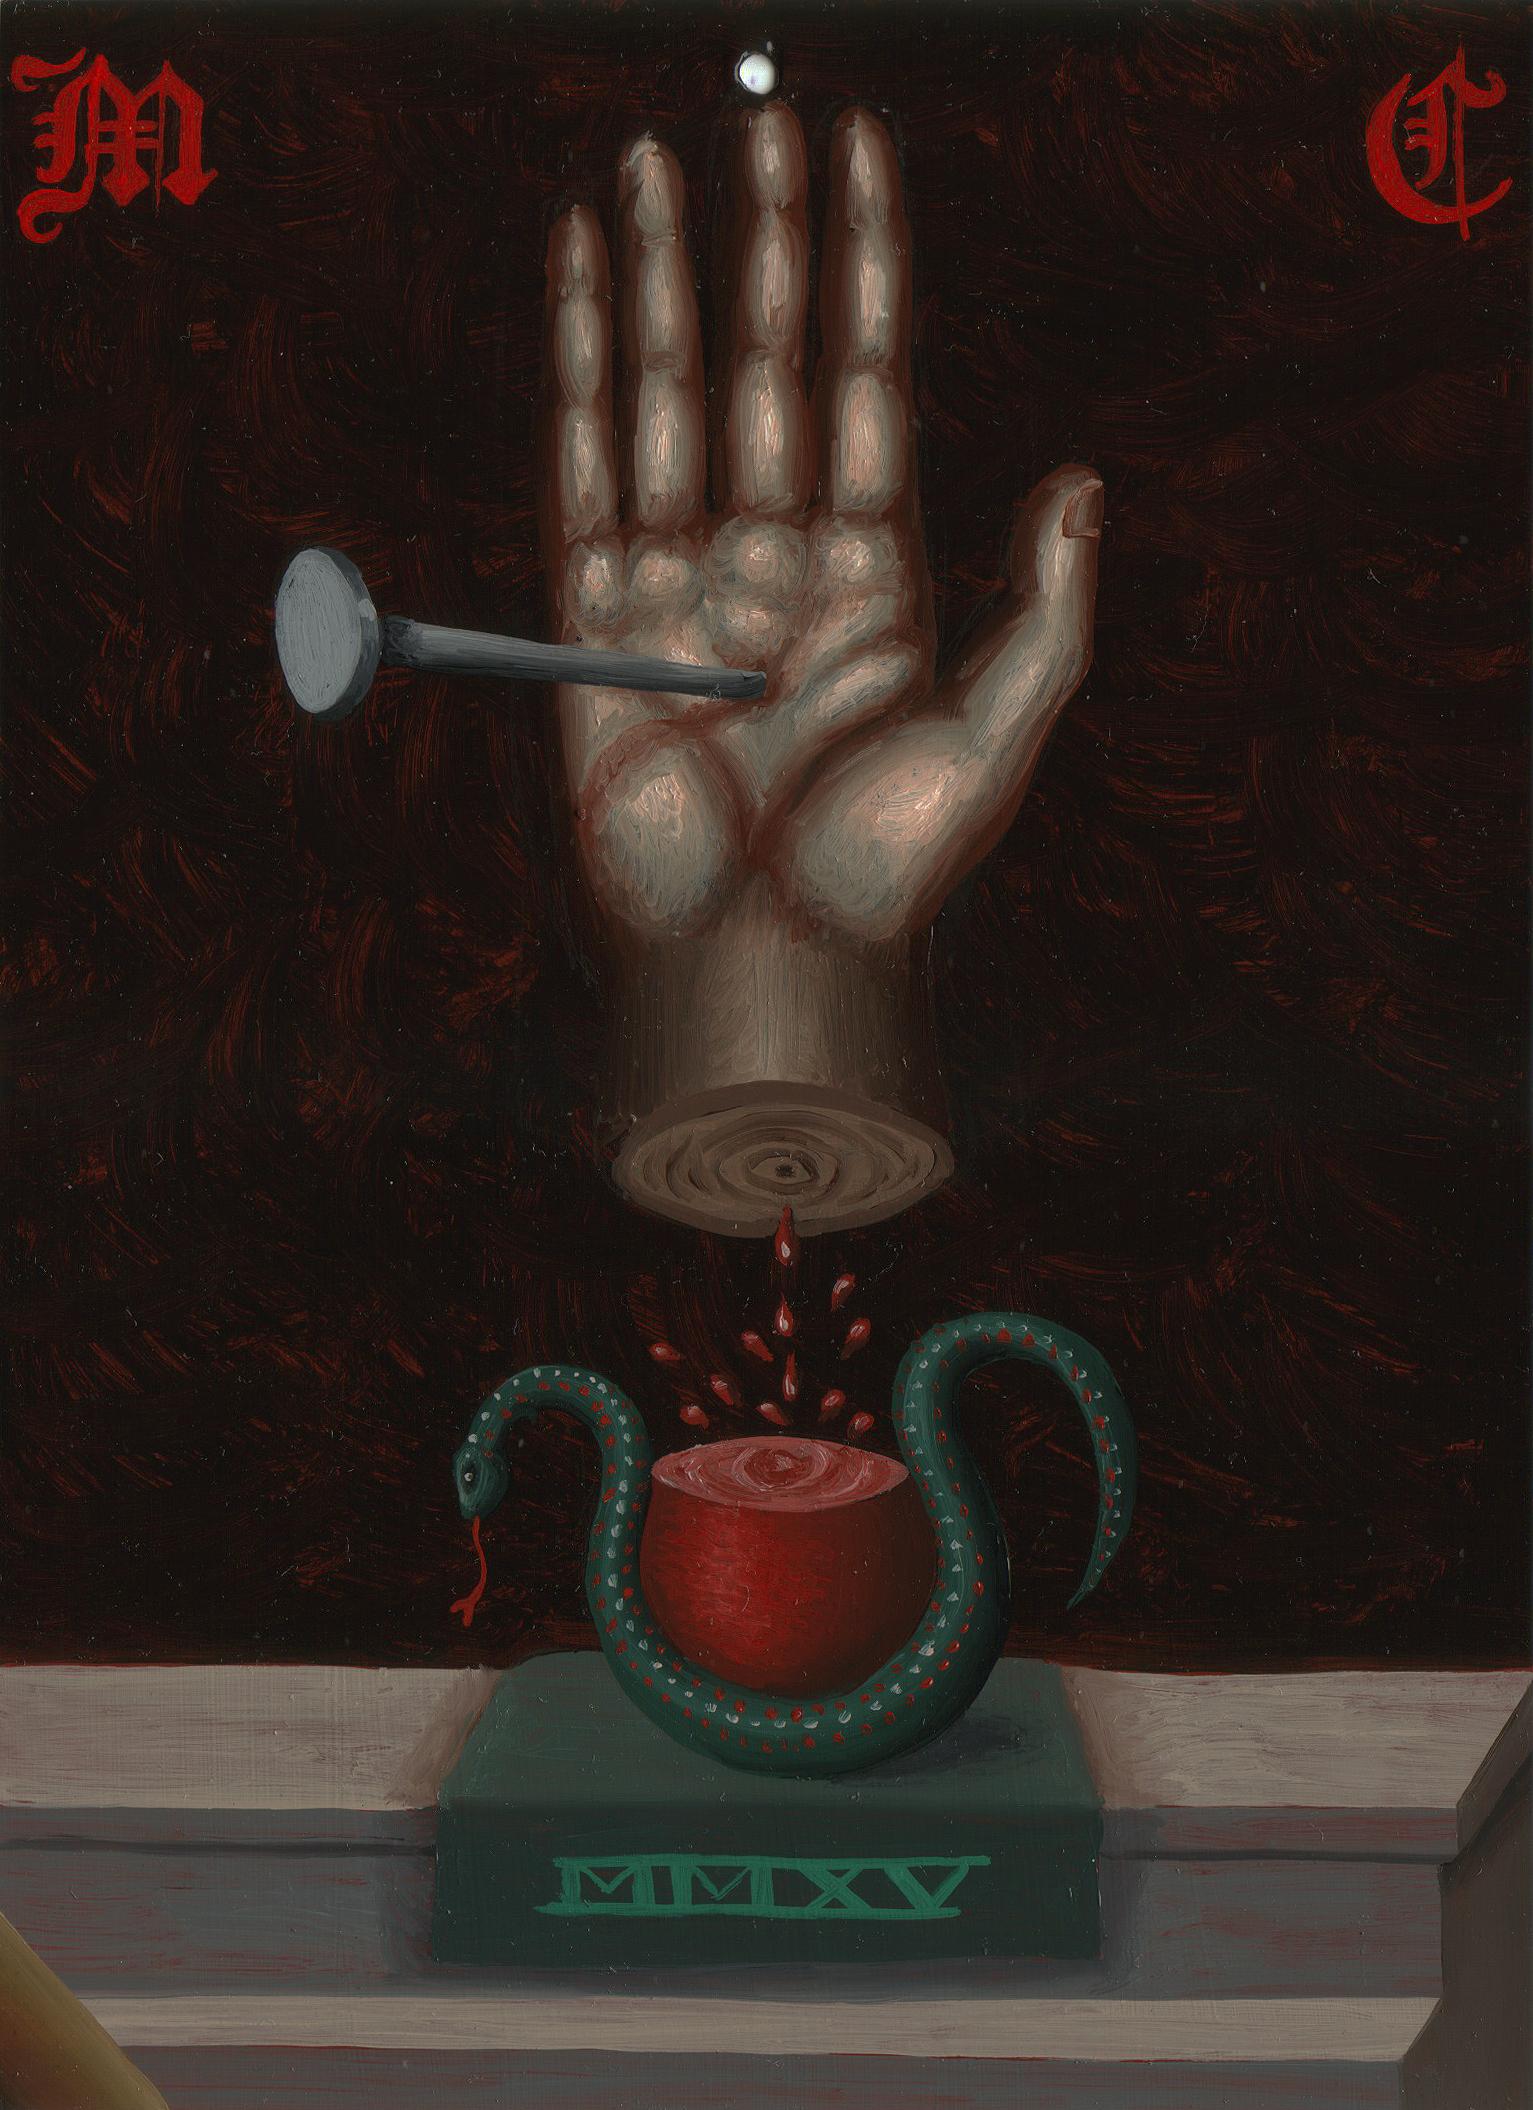 Matthew Couper, Mnemonic Monogram 1, Hand-snake, 2015, Oil on metal, 7x5%22, 17.7x12.7, AUD $750.jpg